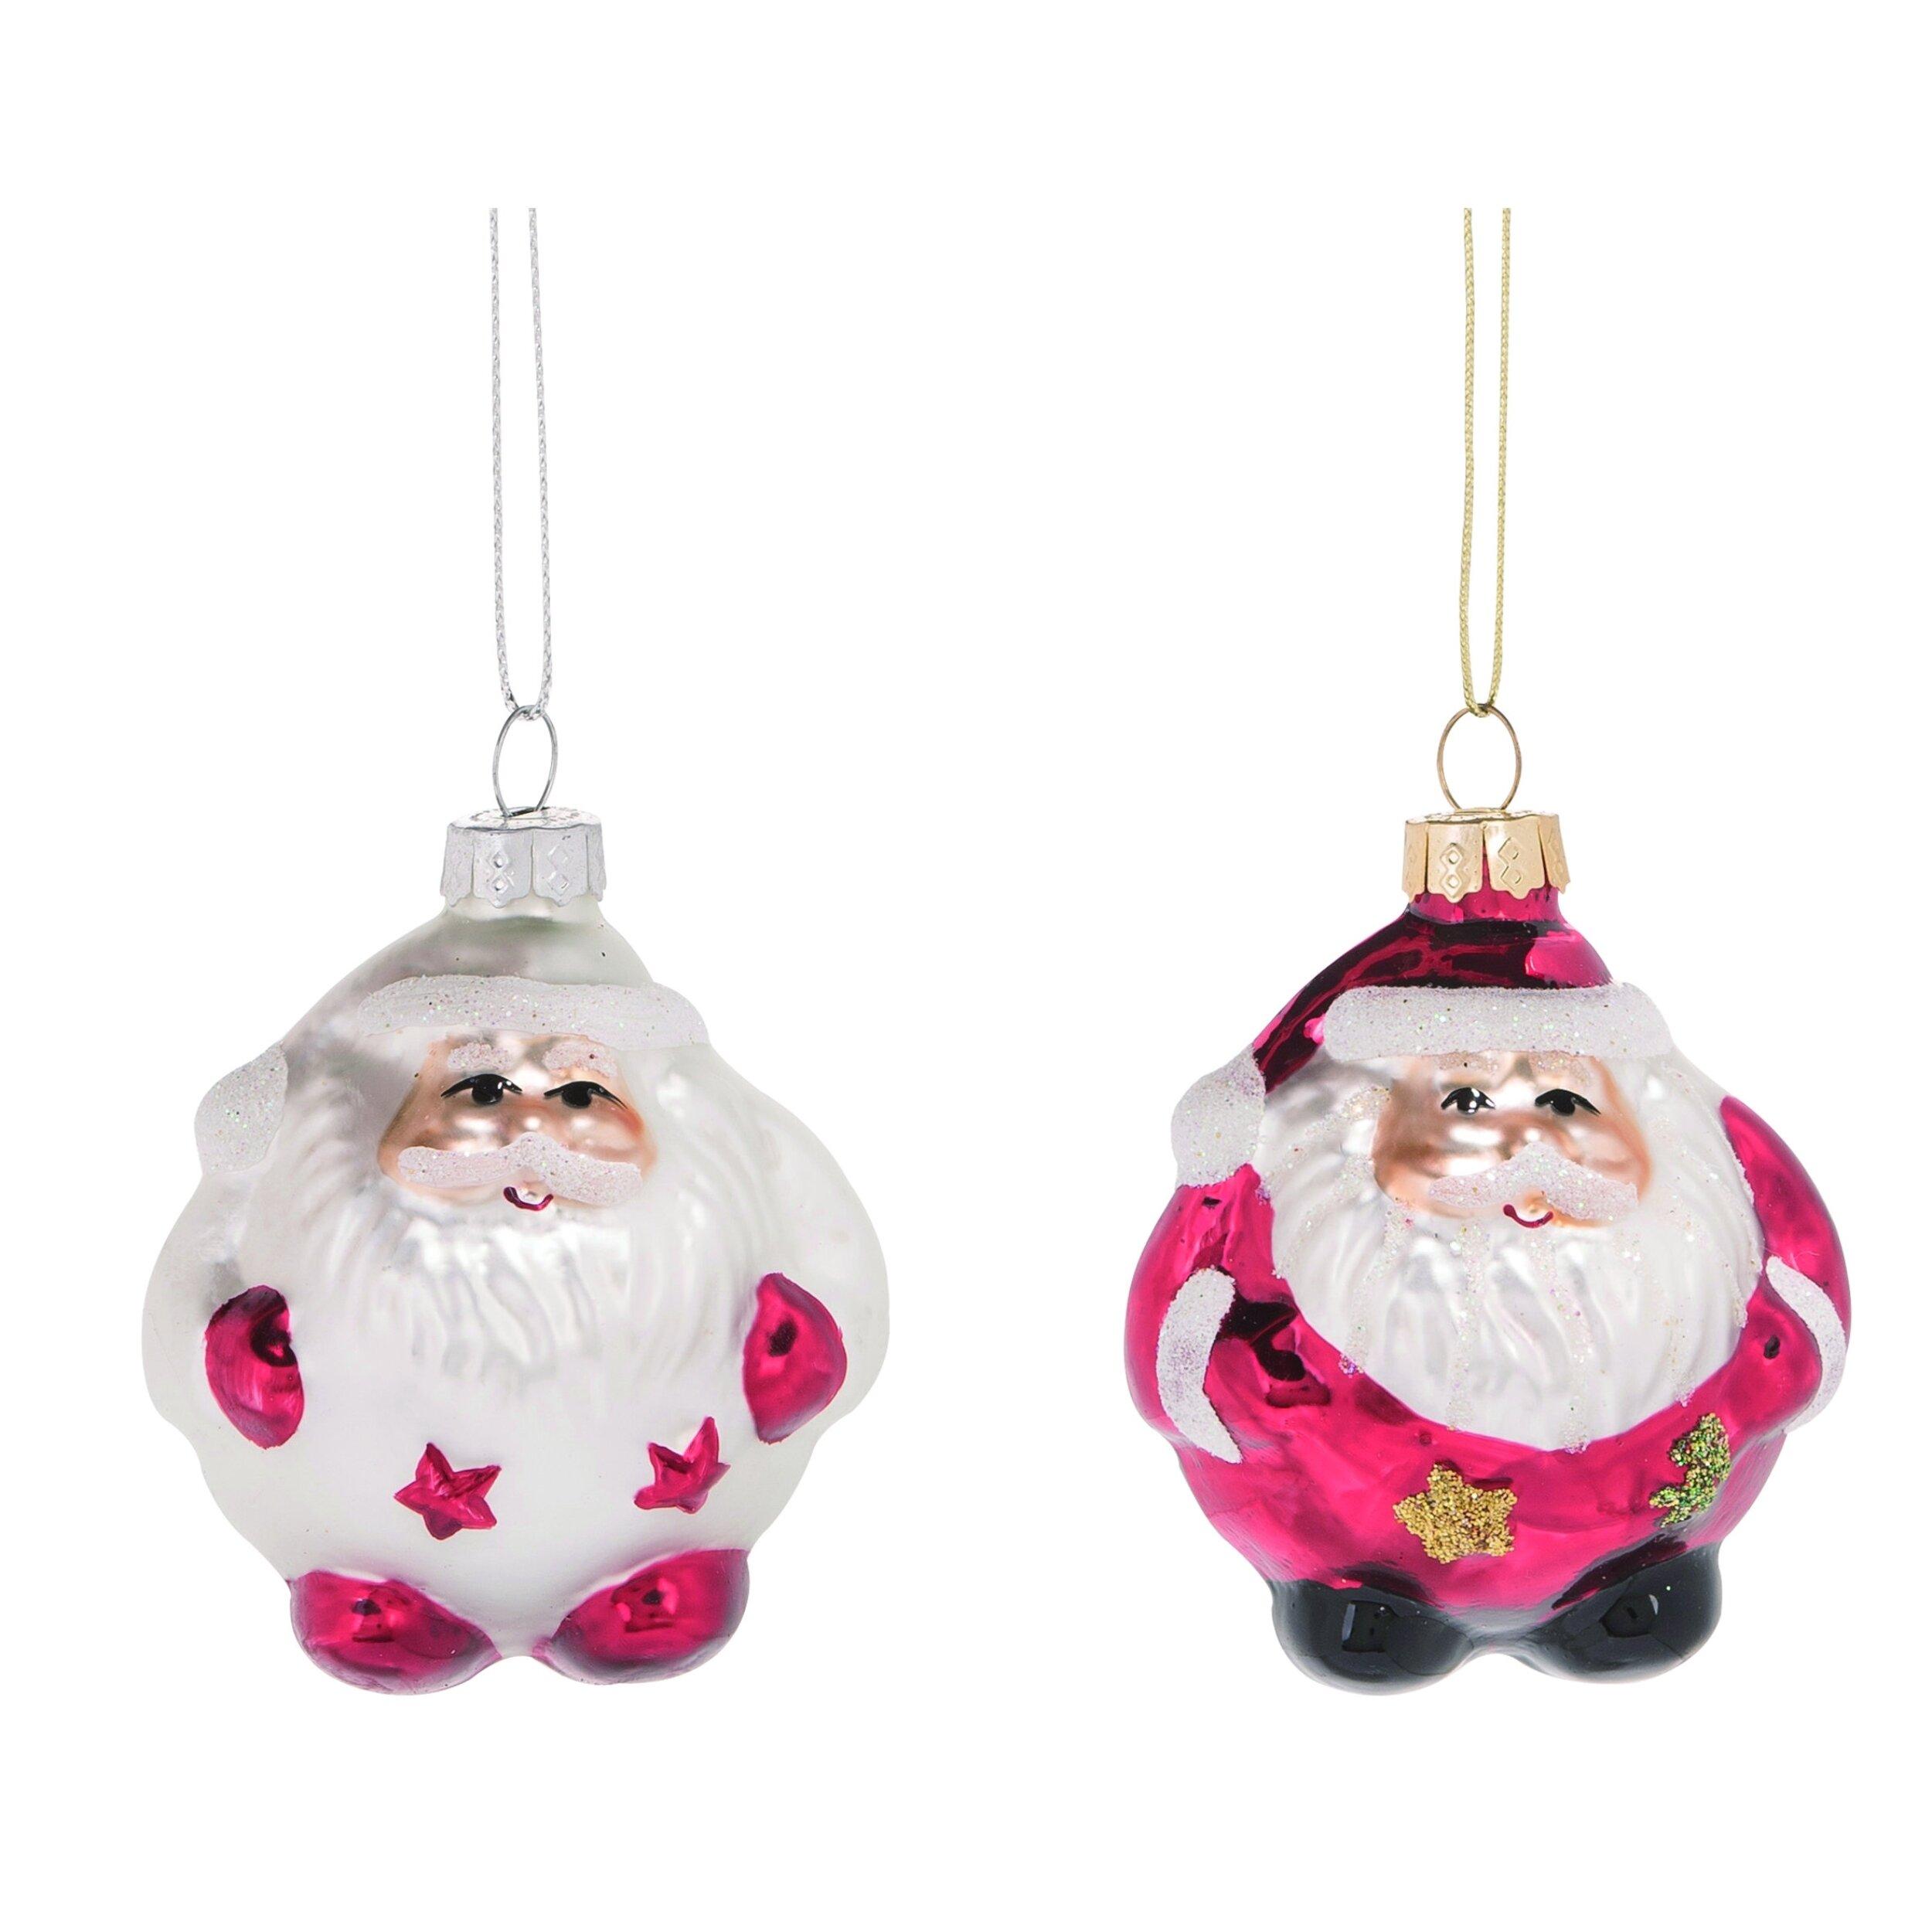 The Holiday Aisle 2 Piece Nostalgic Santa Hanging Figurine Ornament Set Wayfair